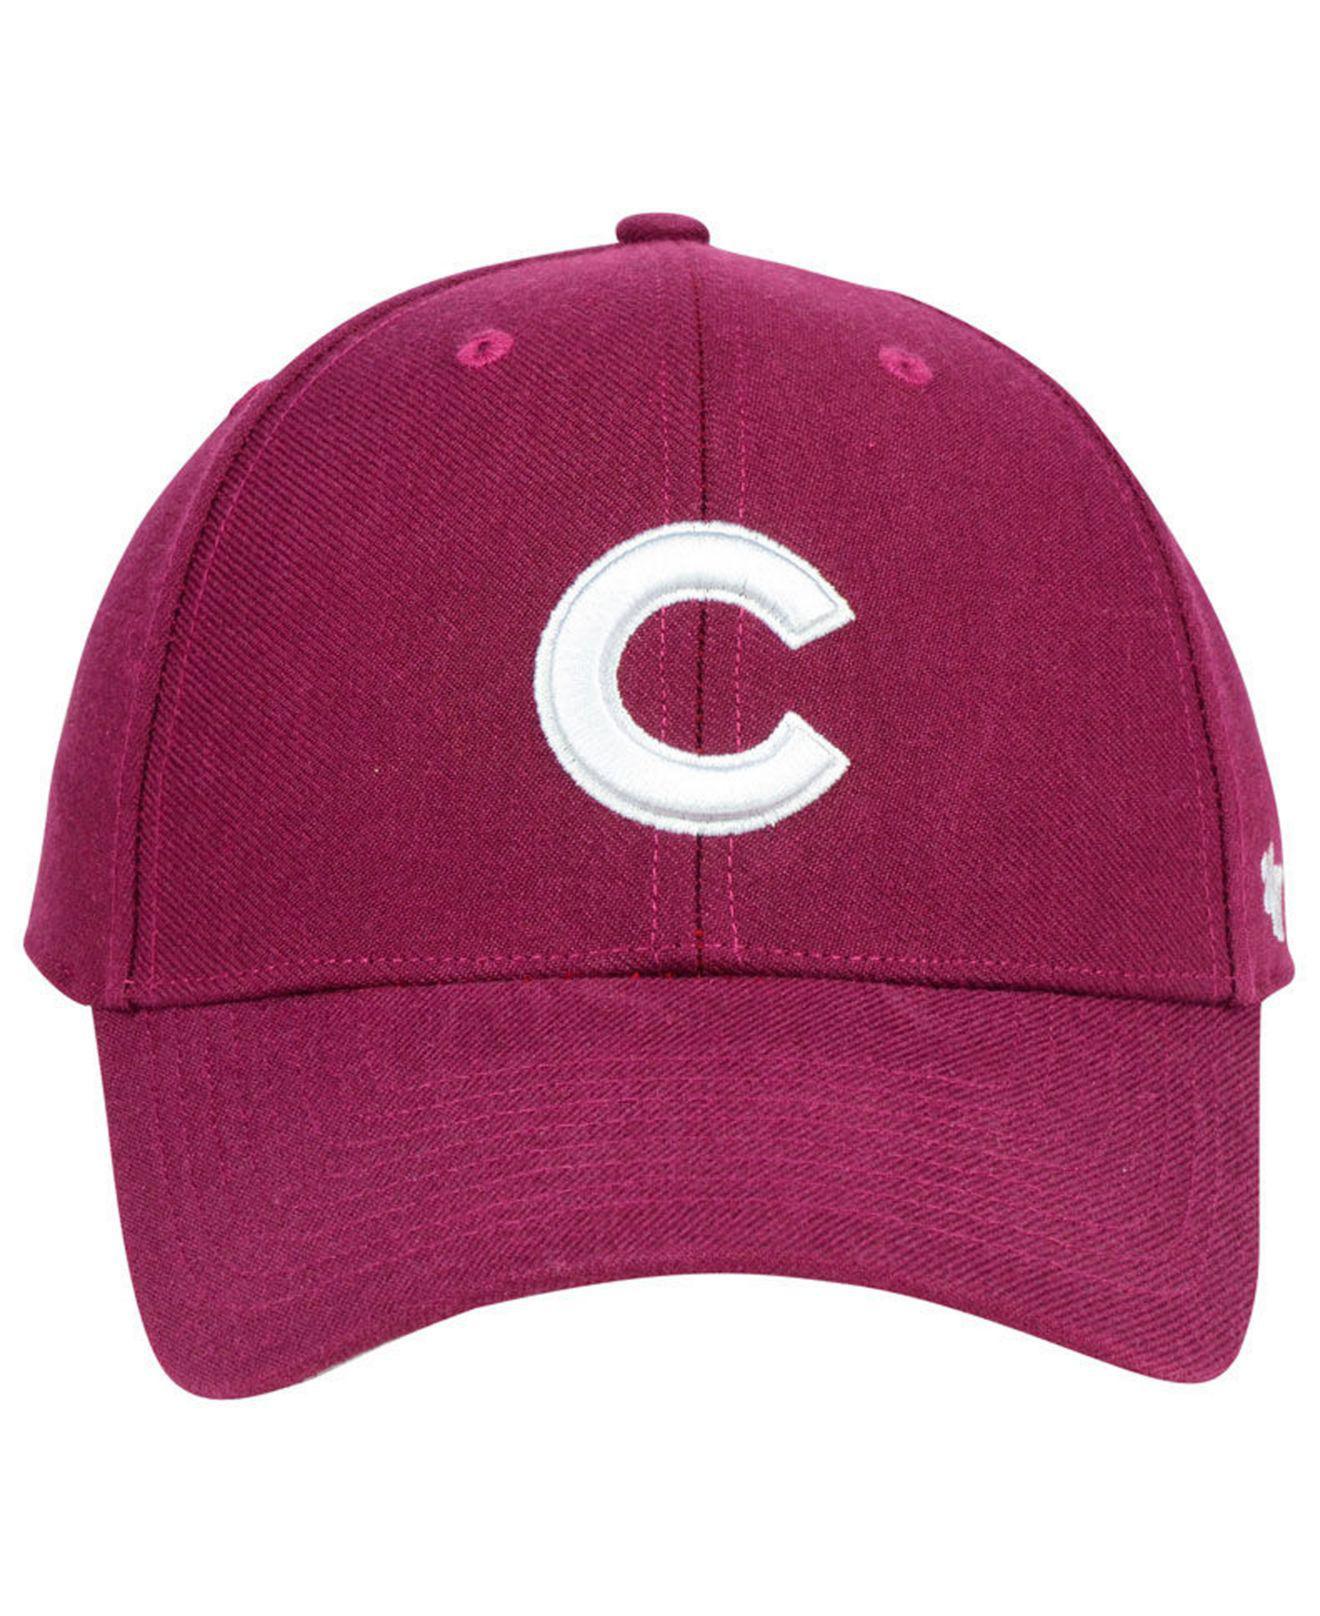 9ab71177ba7 ... official lyst 47 brand chicago cubs cardinal mvp cap for men c6504 2f517